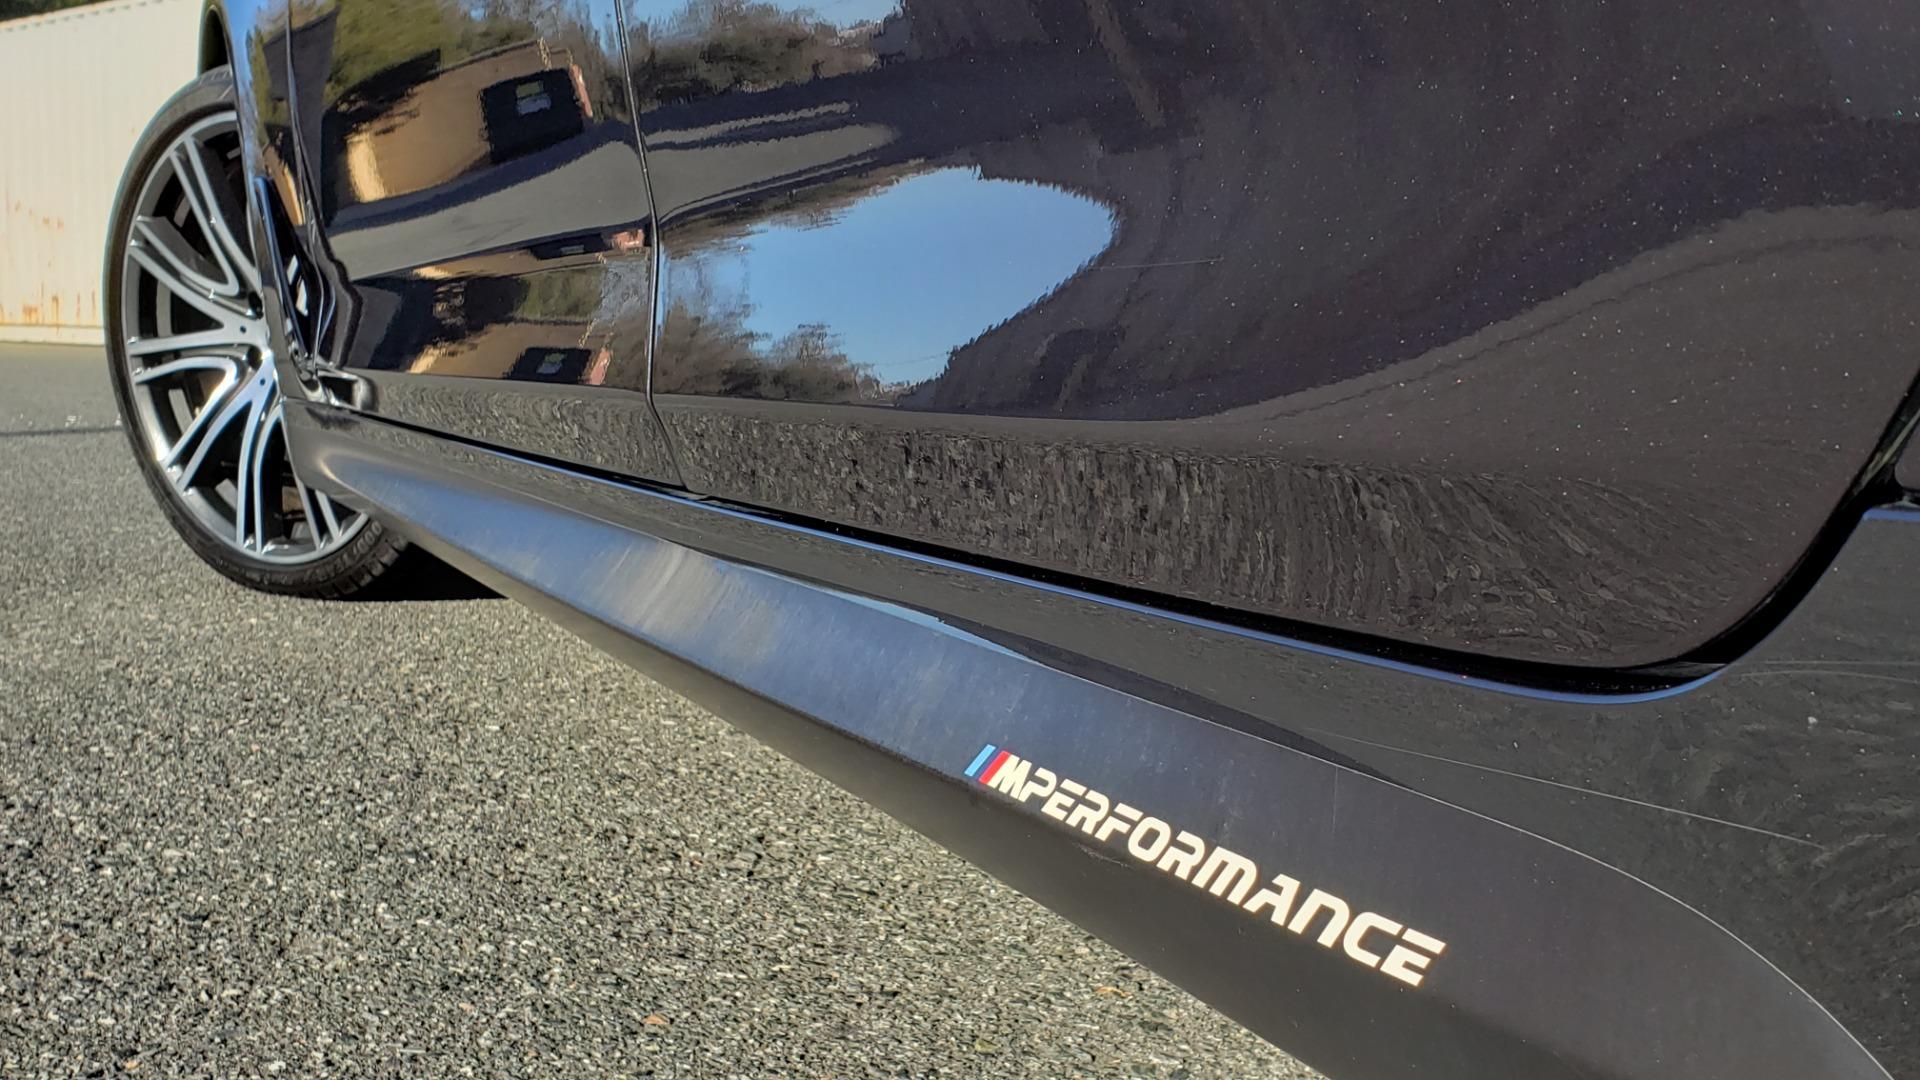 Used 2018 BMW 5 SERIES 540I M-SPORT / DRVR ASST / EXEC PKG / NAV / SUNROOF / HUD / REARVIEW for sale Sold at Formula Imports in Charlotte NC 28227 7